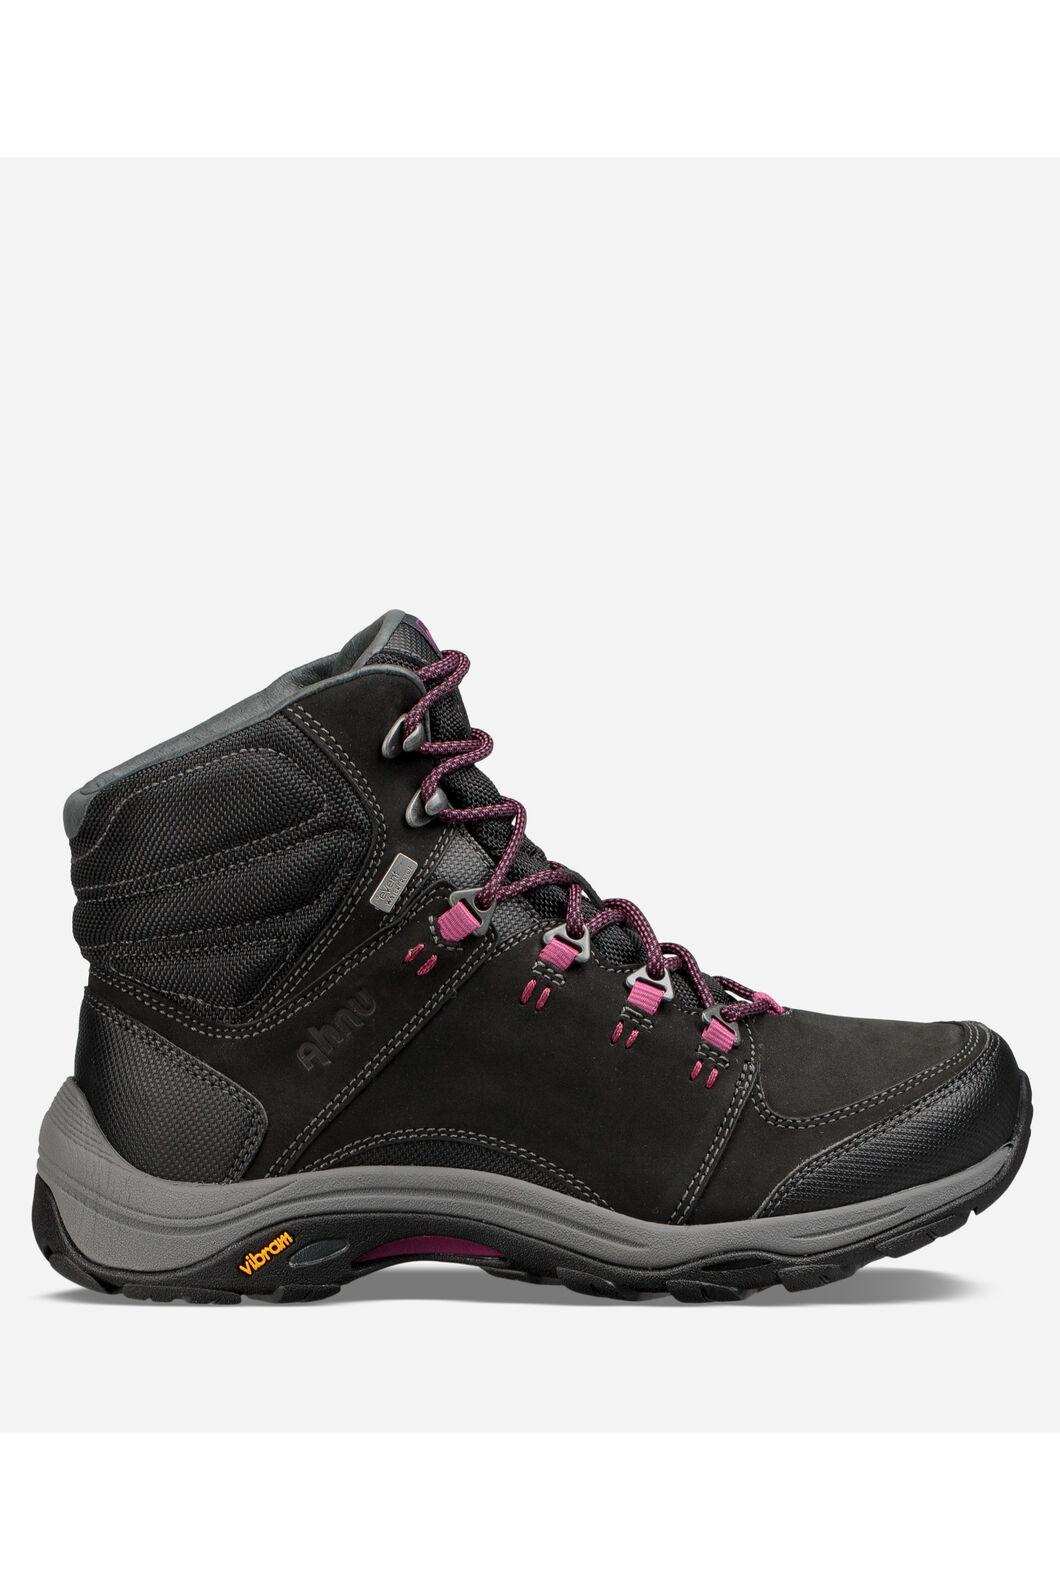 Ahnu Montara III Boots -Women's, Black, hi-res